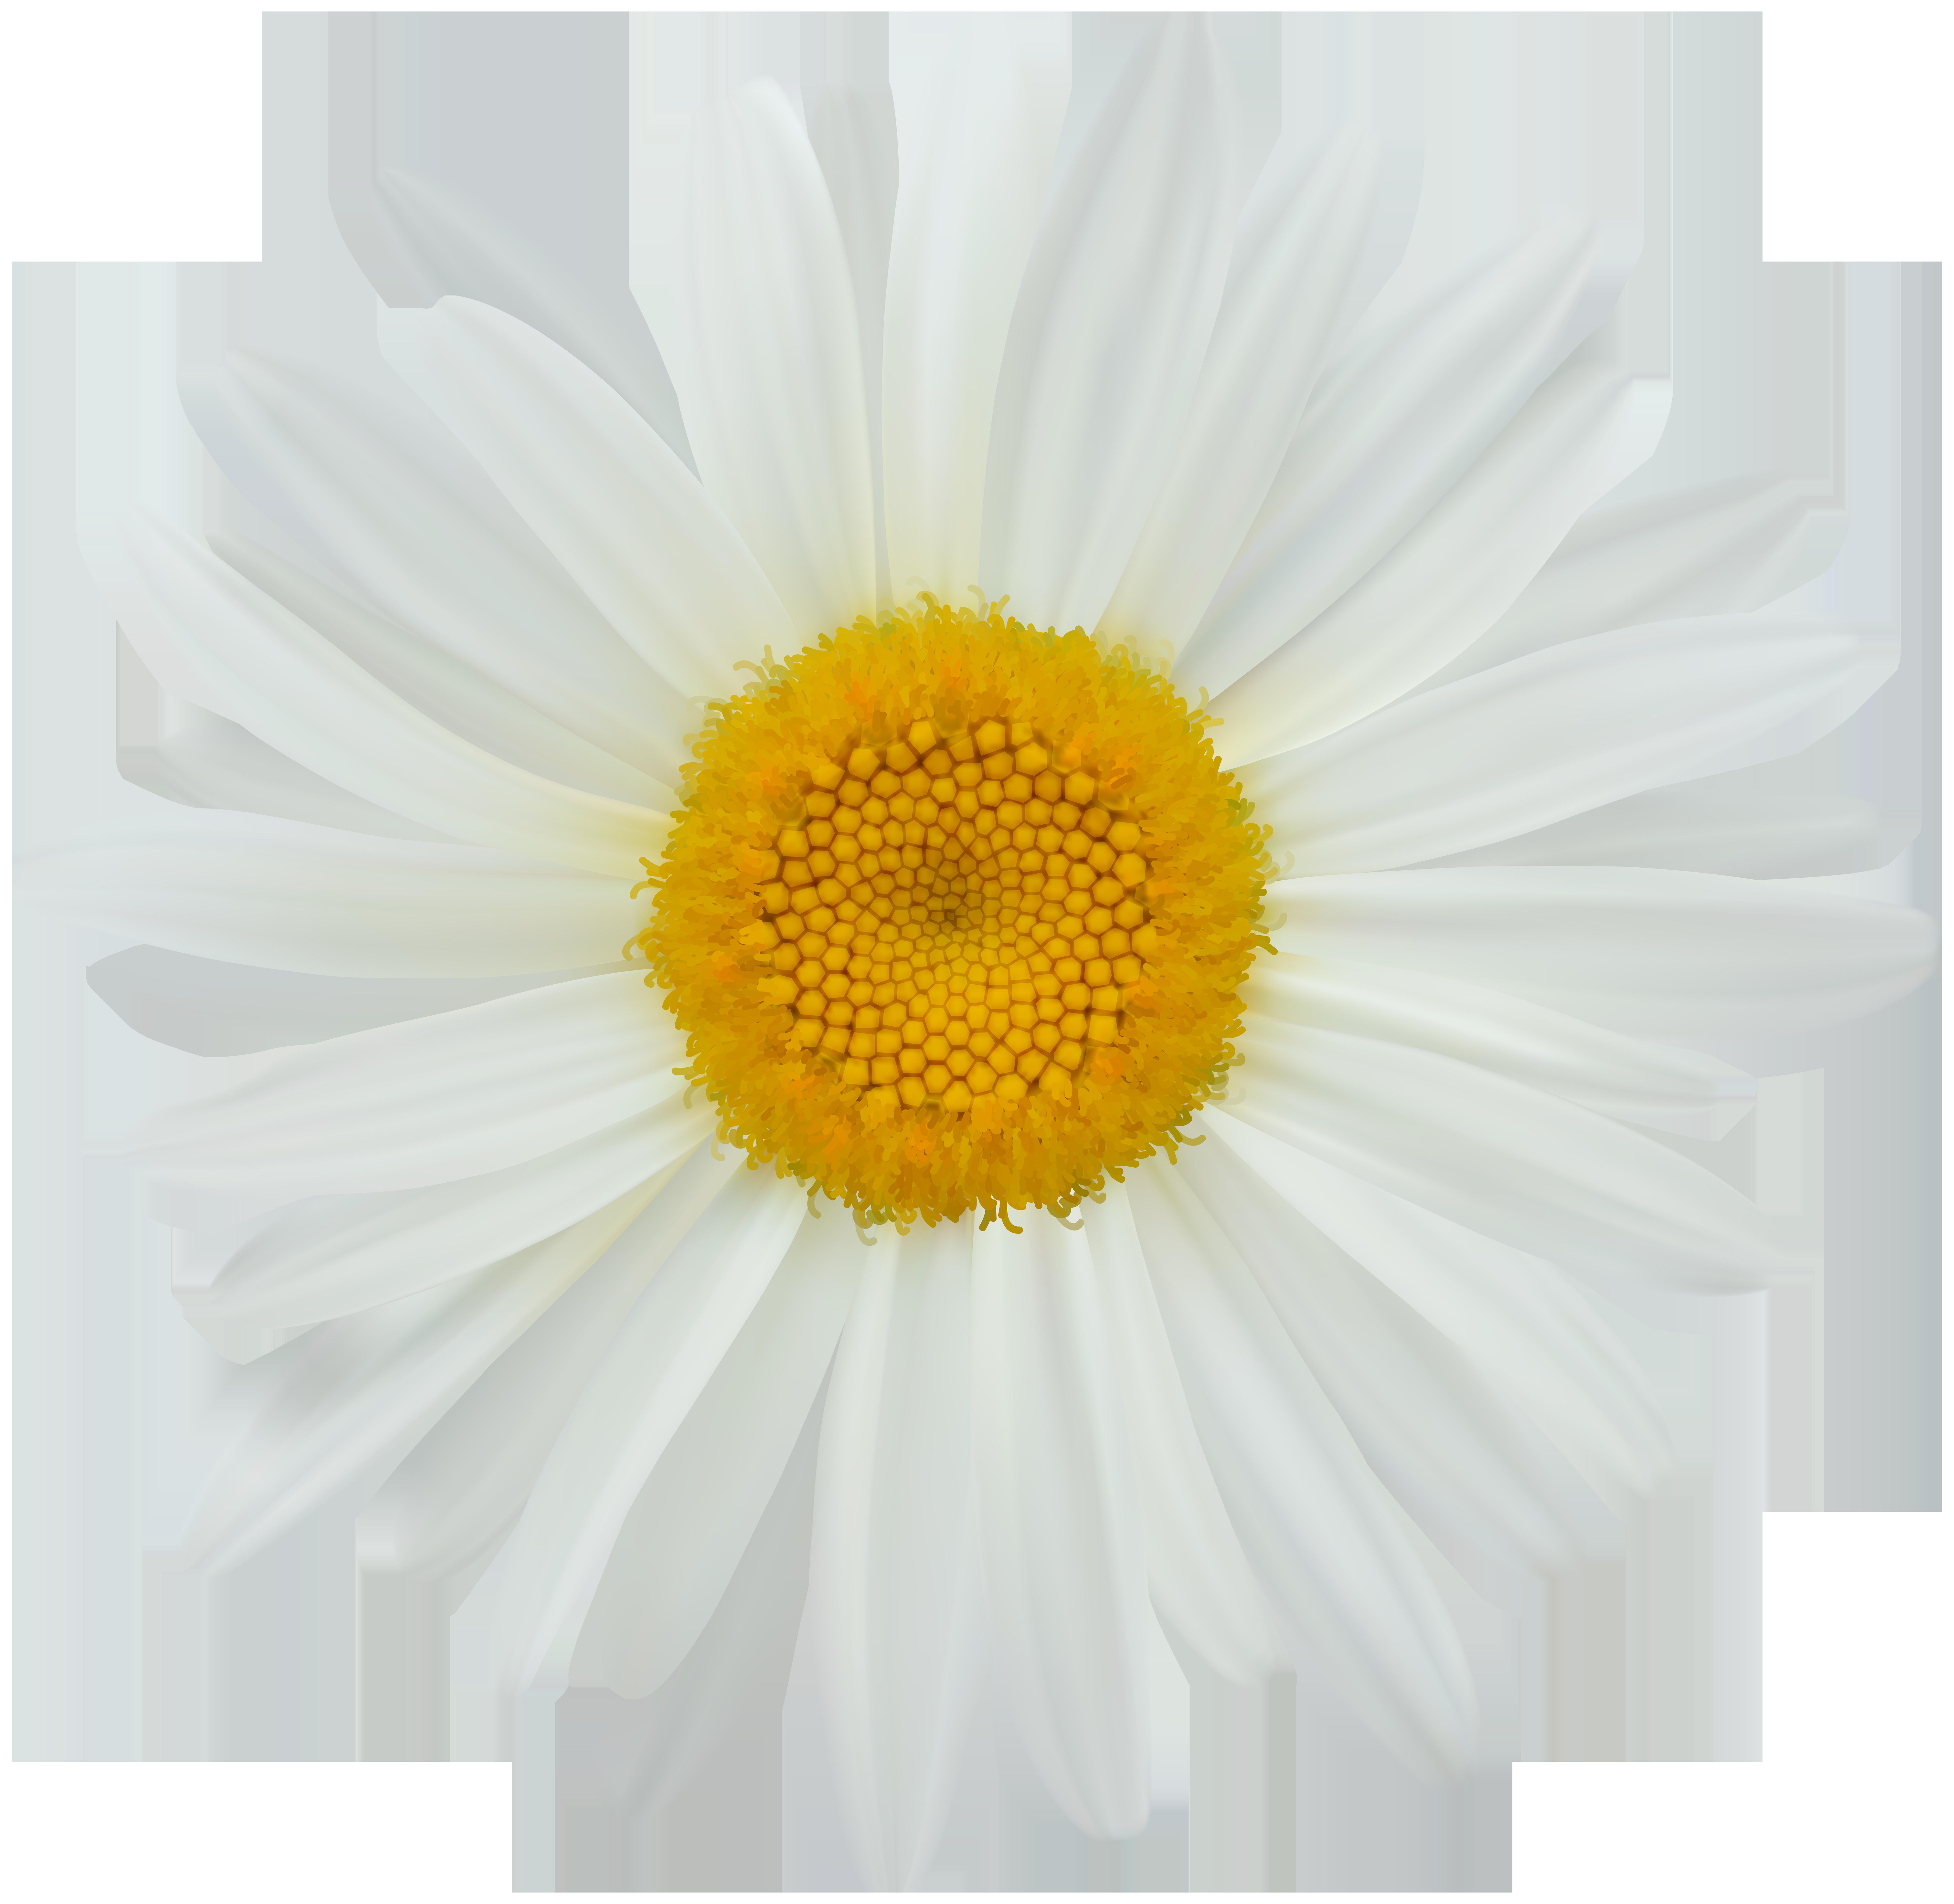 Daisy clip art png. Daisies clipart summer